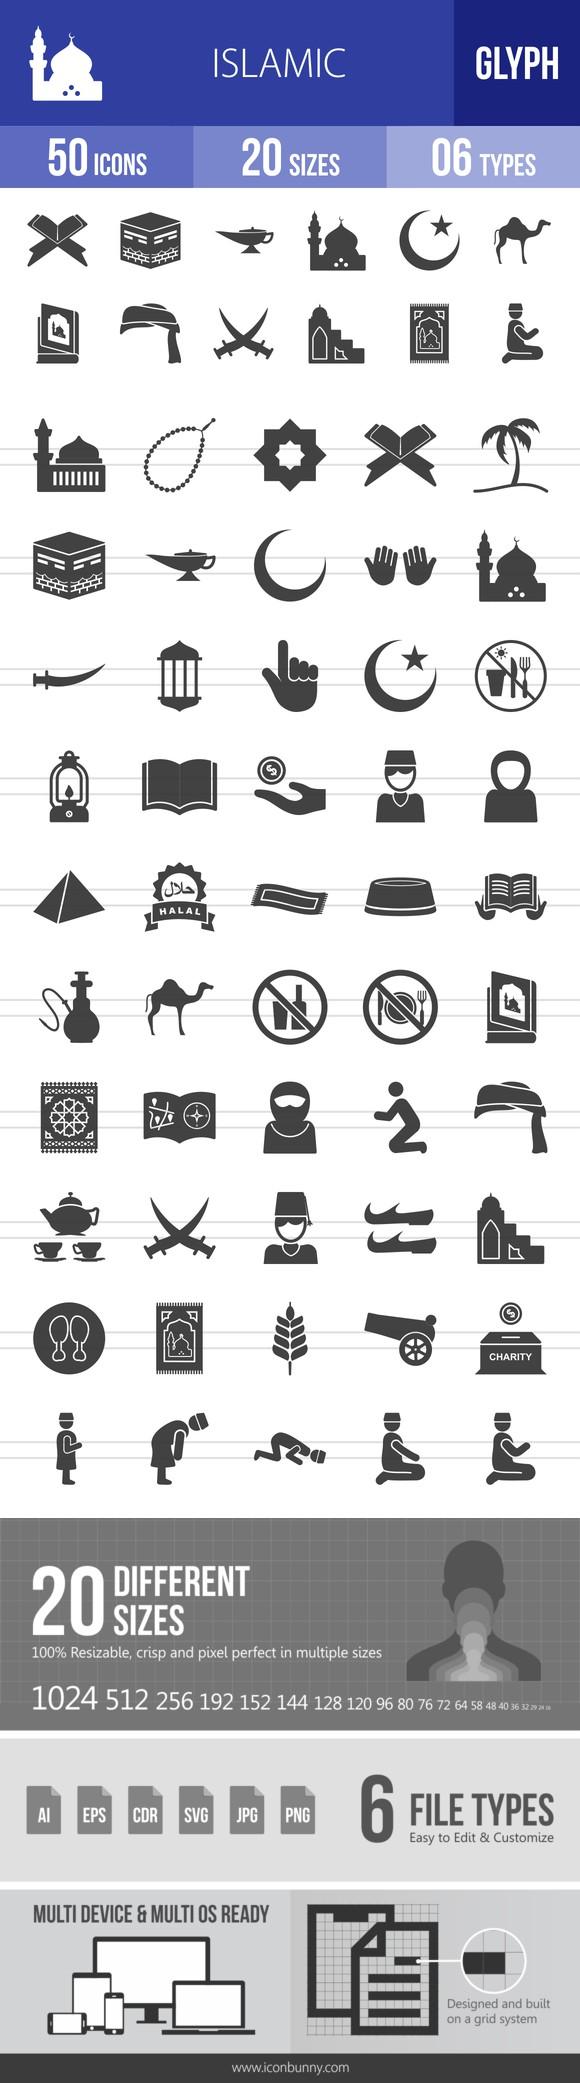 1120 Flat Shadowed Icons. Islamic Icons. $39.00   Islamic Icons ...